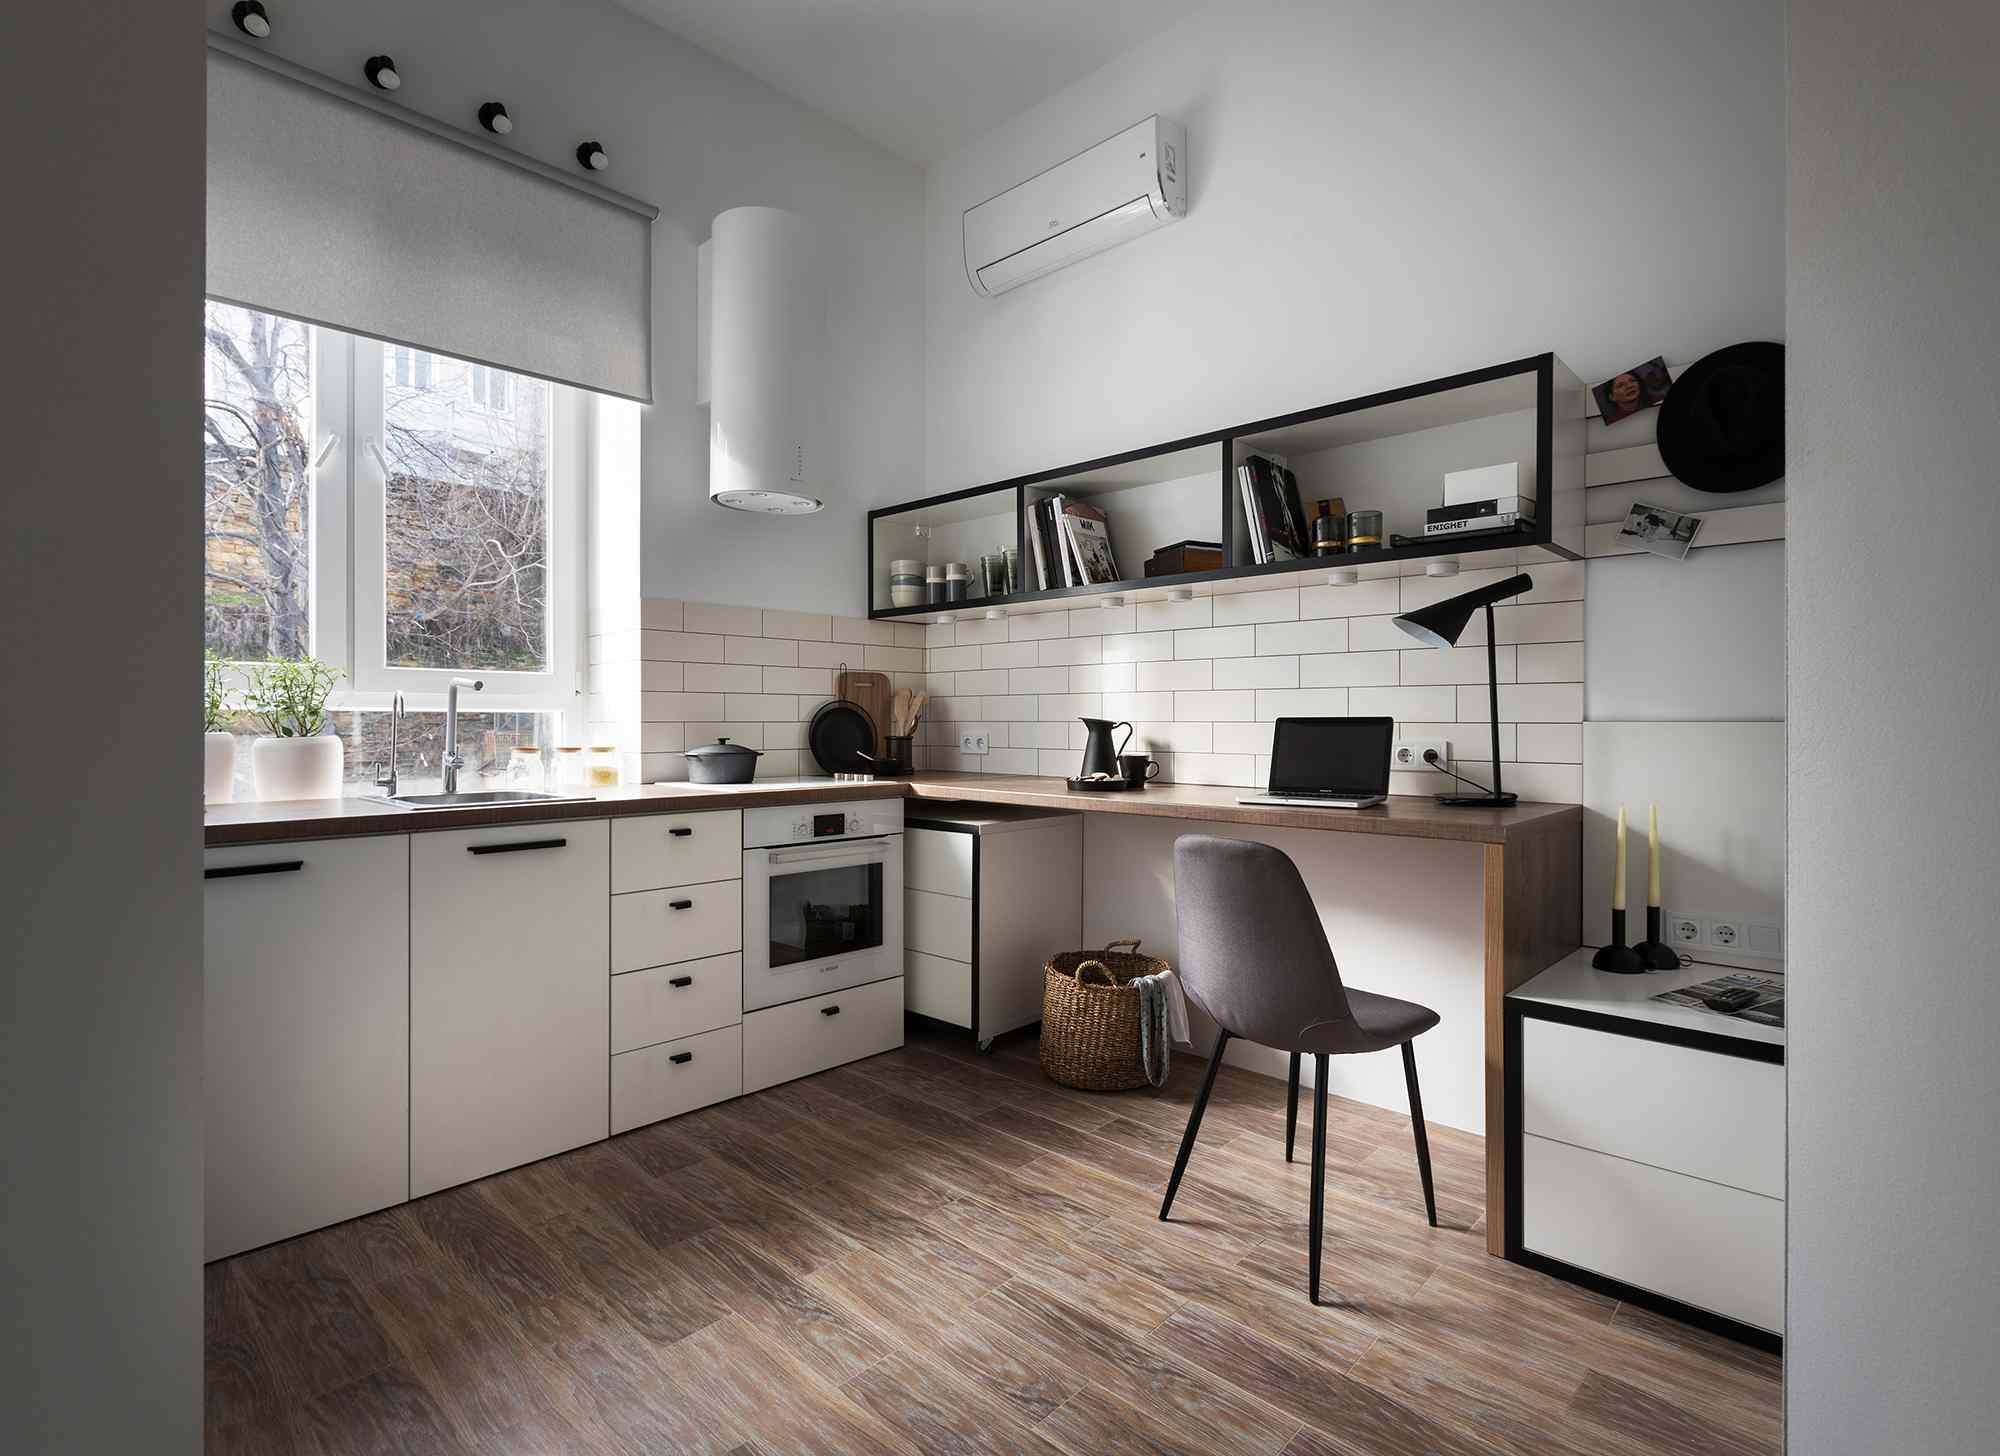 Odessa micro-apartment renovation Fateeva Design interior view from entry